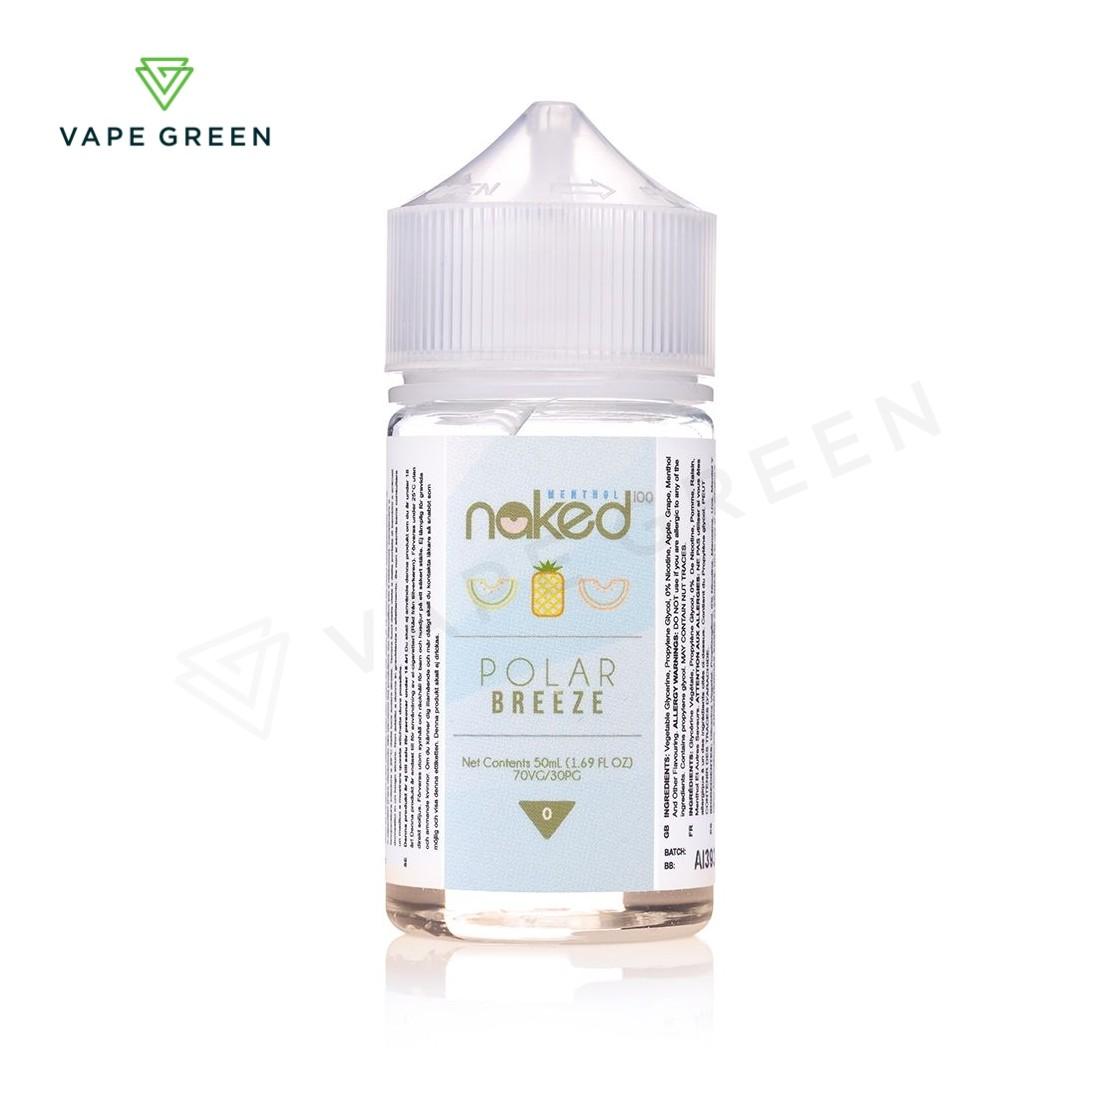 Polar Breeze E-liquid by Naked 100 - 50ml